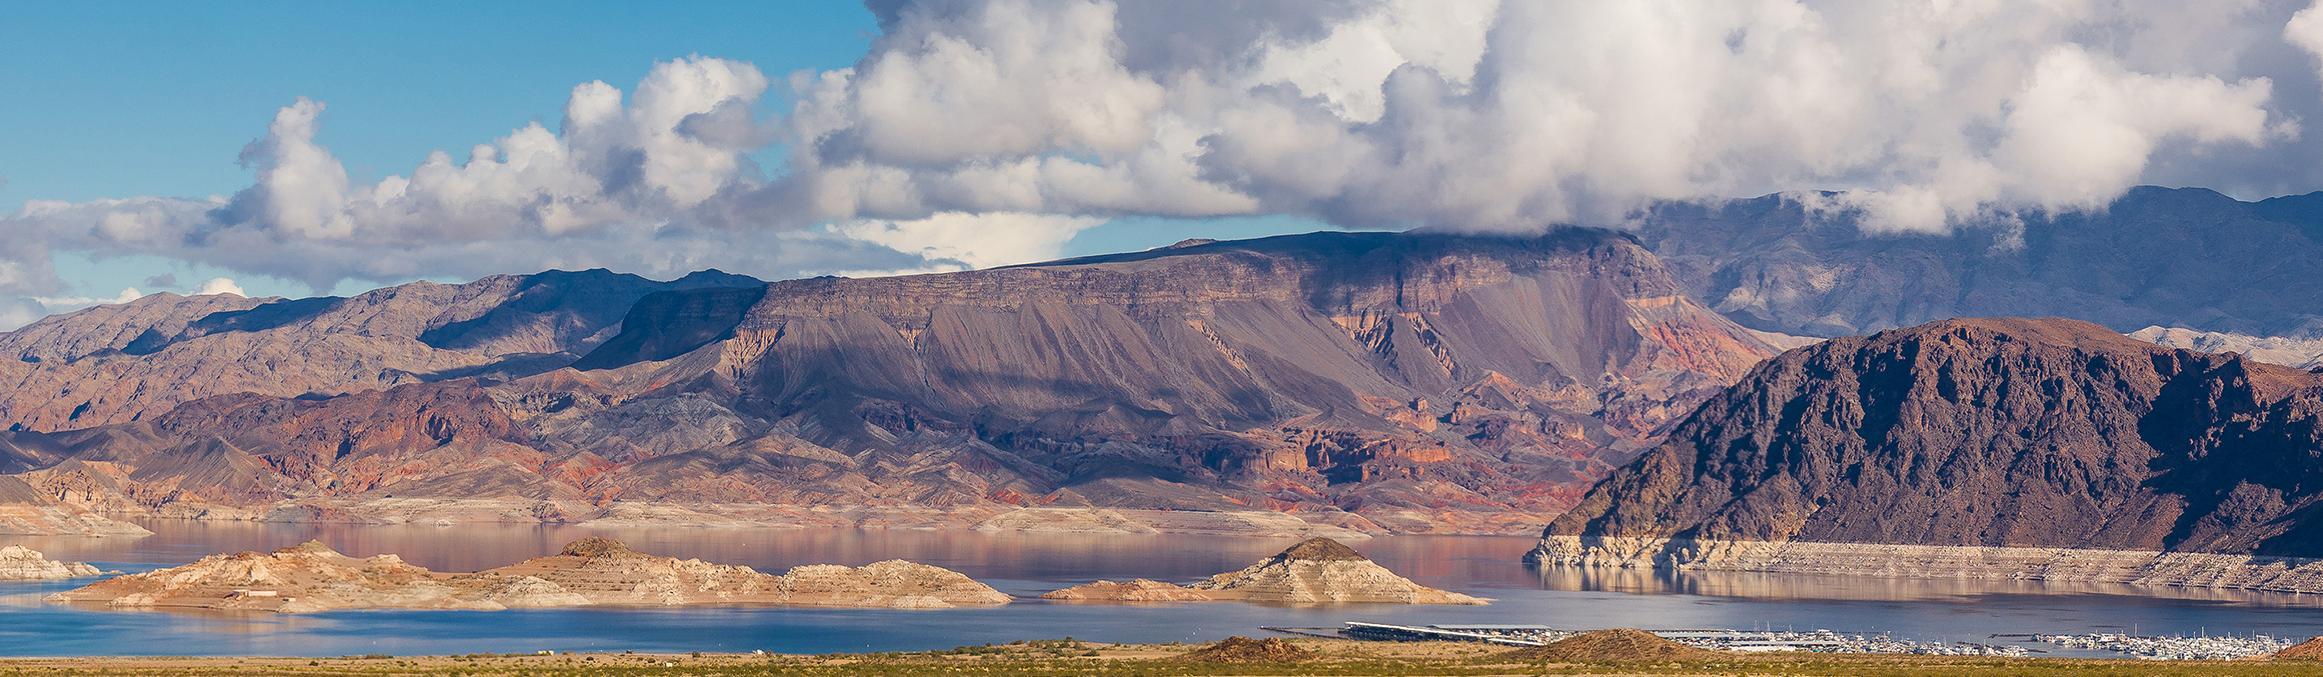 Lake Mead National Recreation Area (U S  National Park Service)